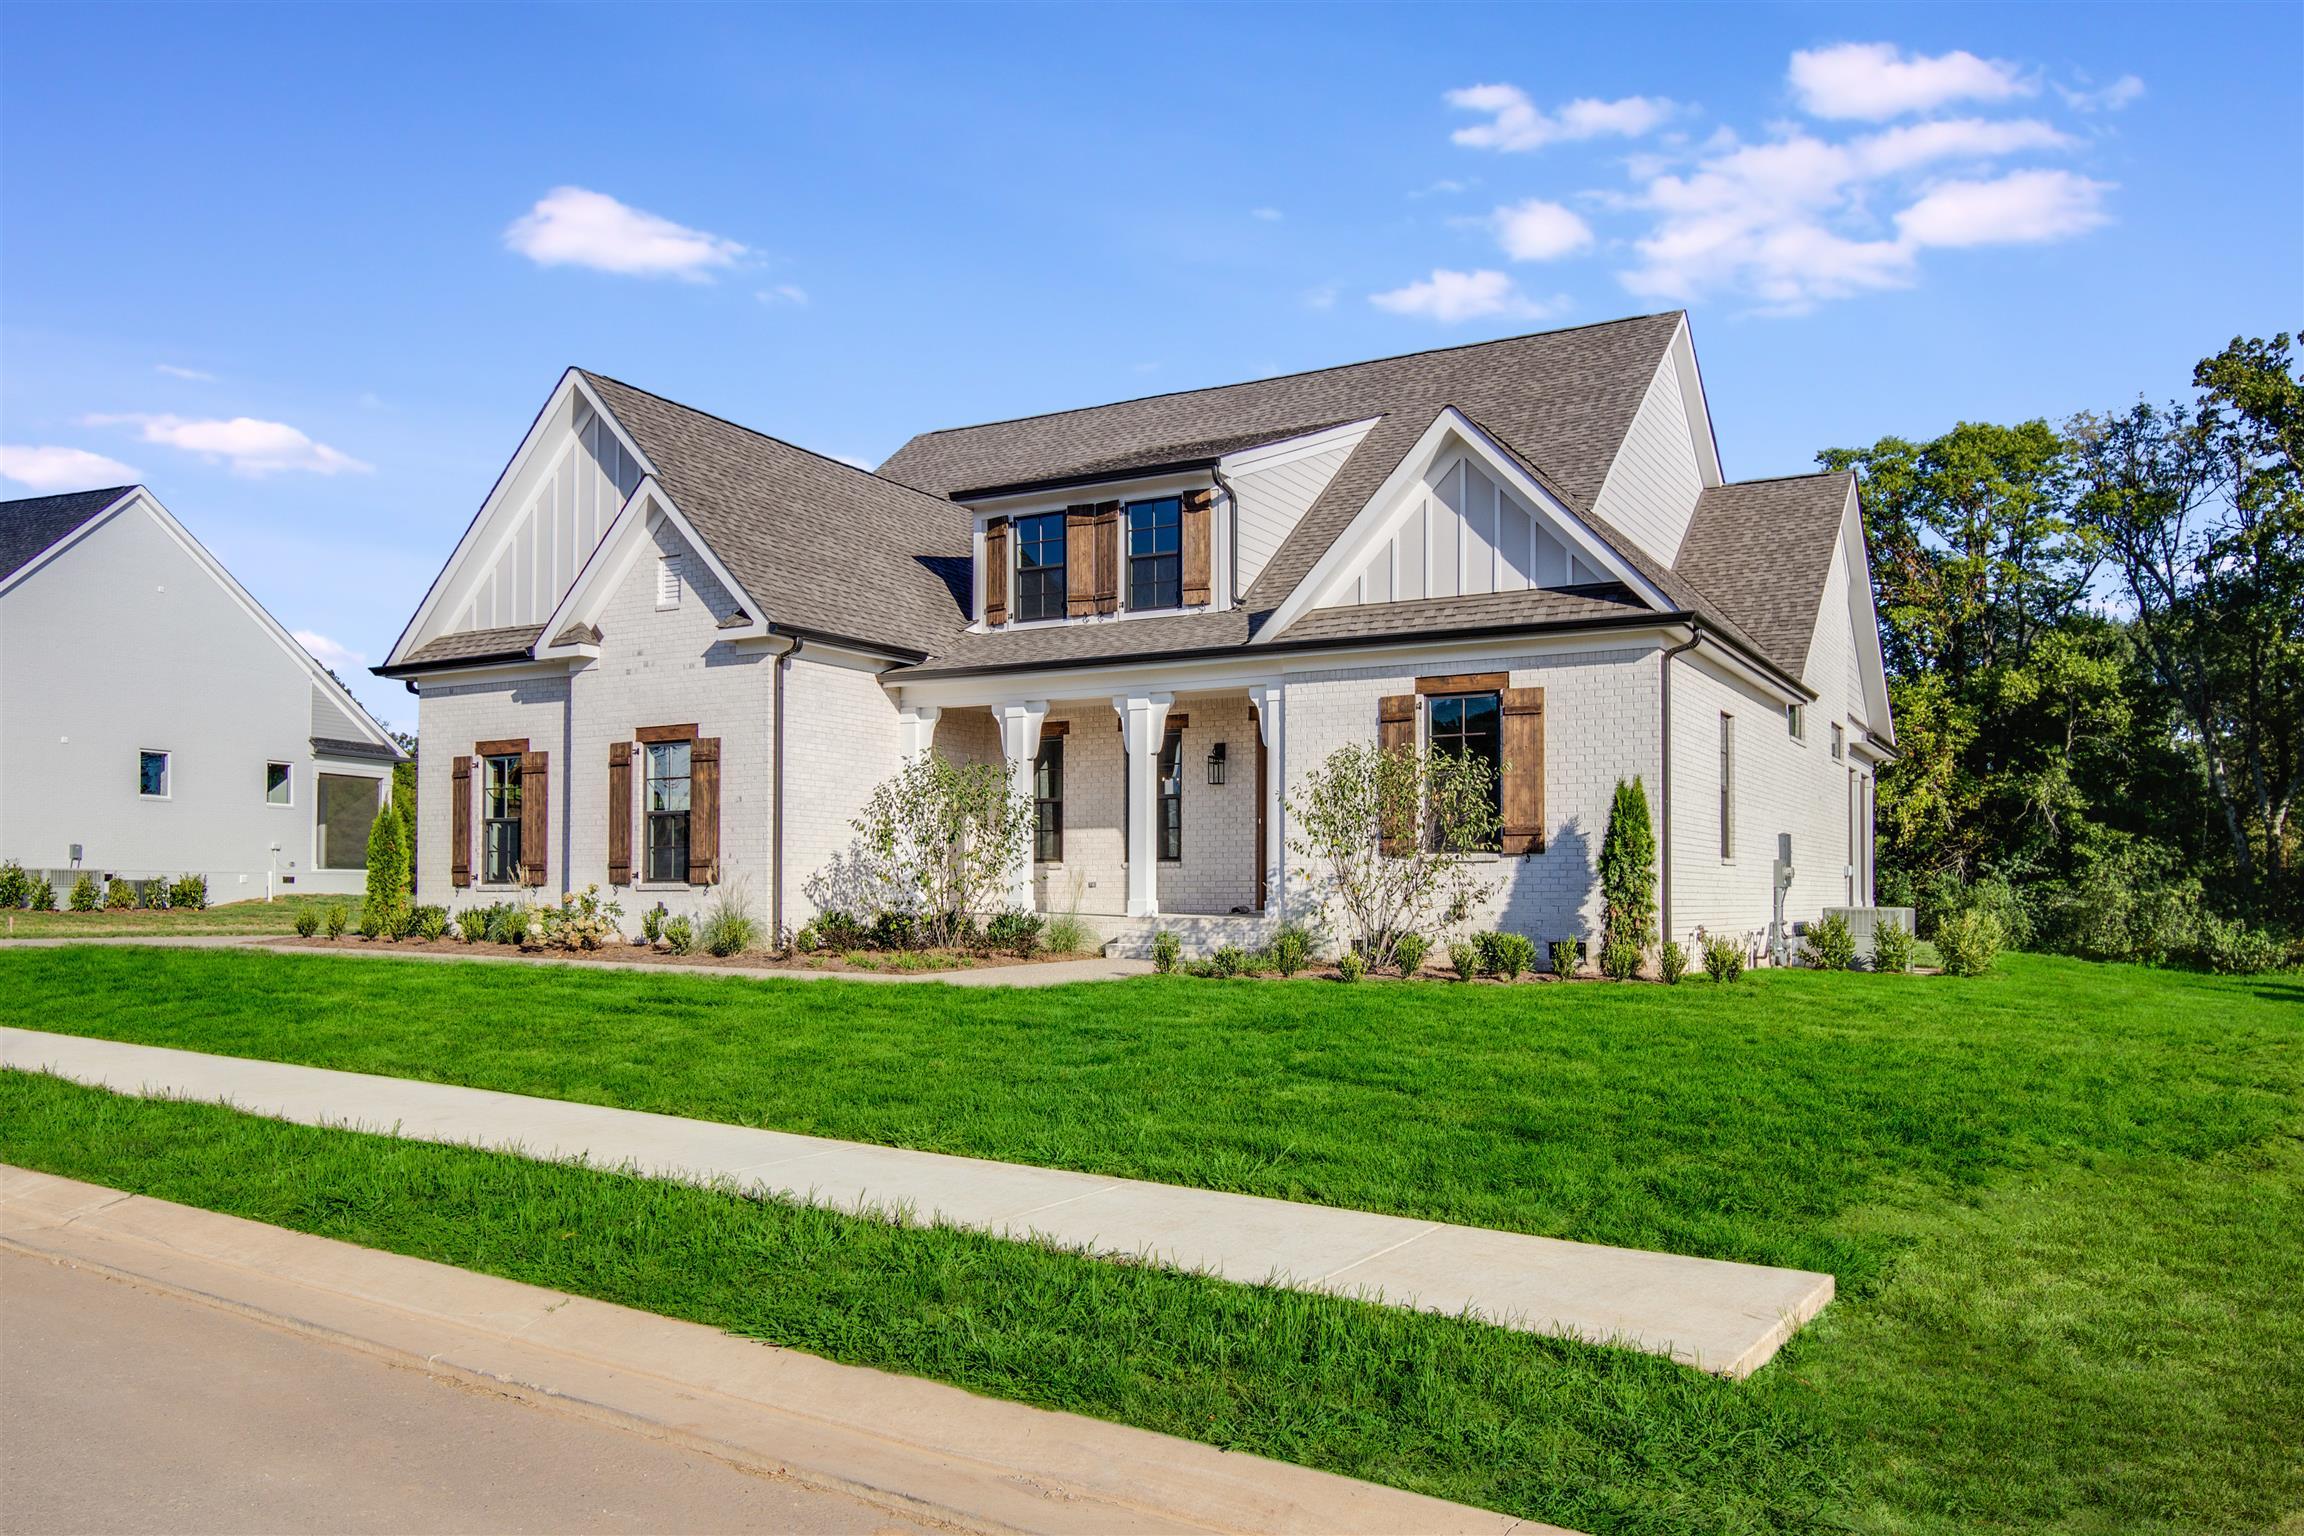 4605 Majestic Meadows Dr LOT822, Arrington, TN 37014 - Arrington, TN real estate listing